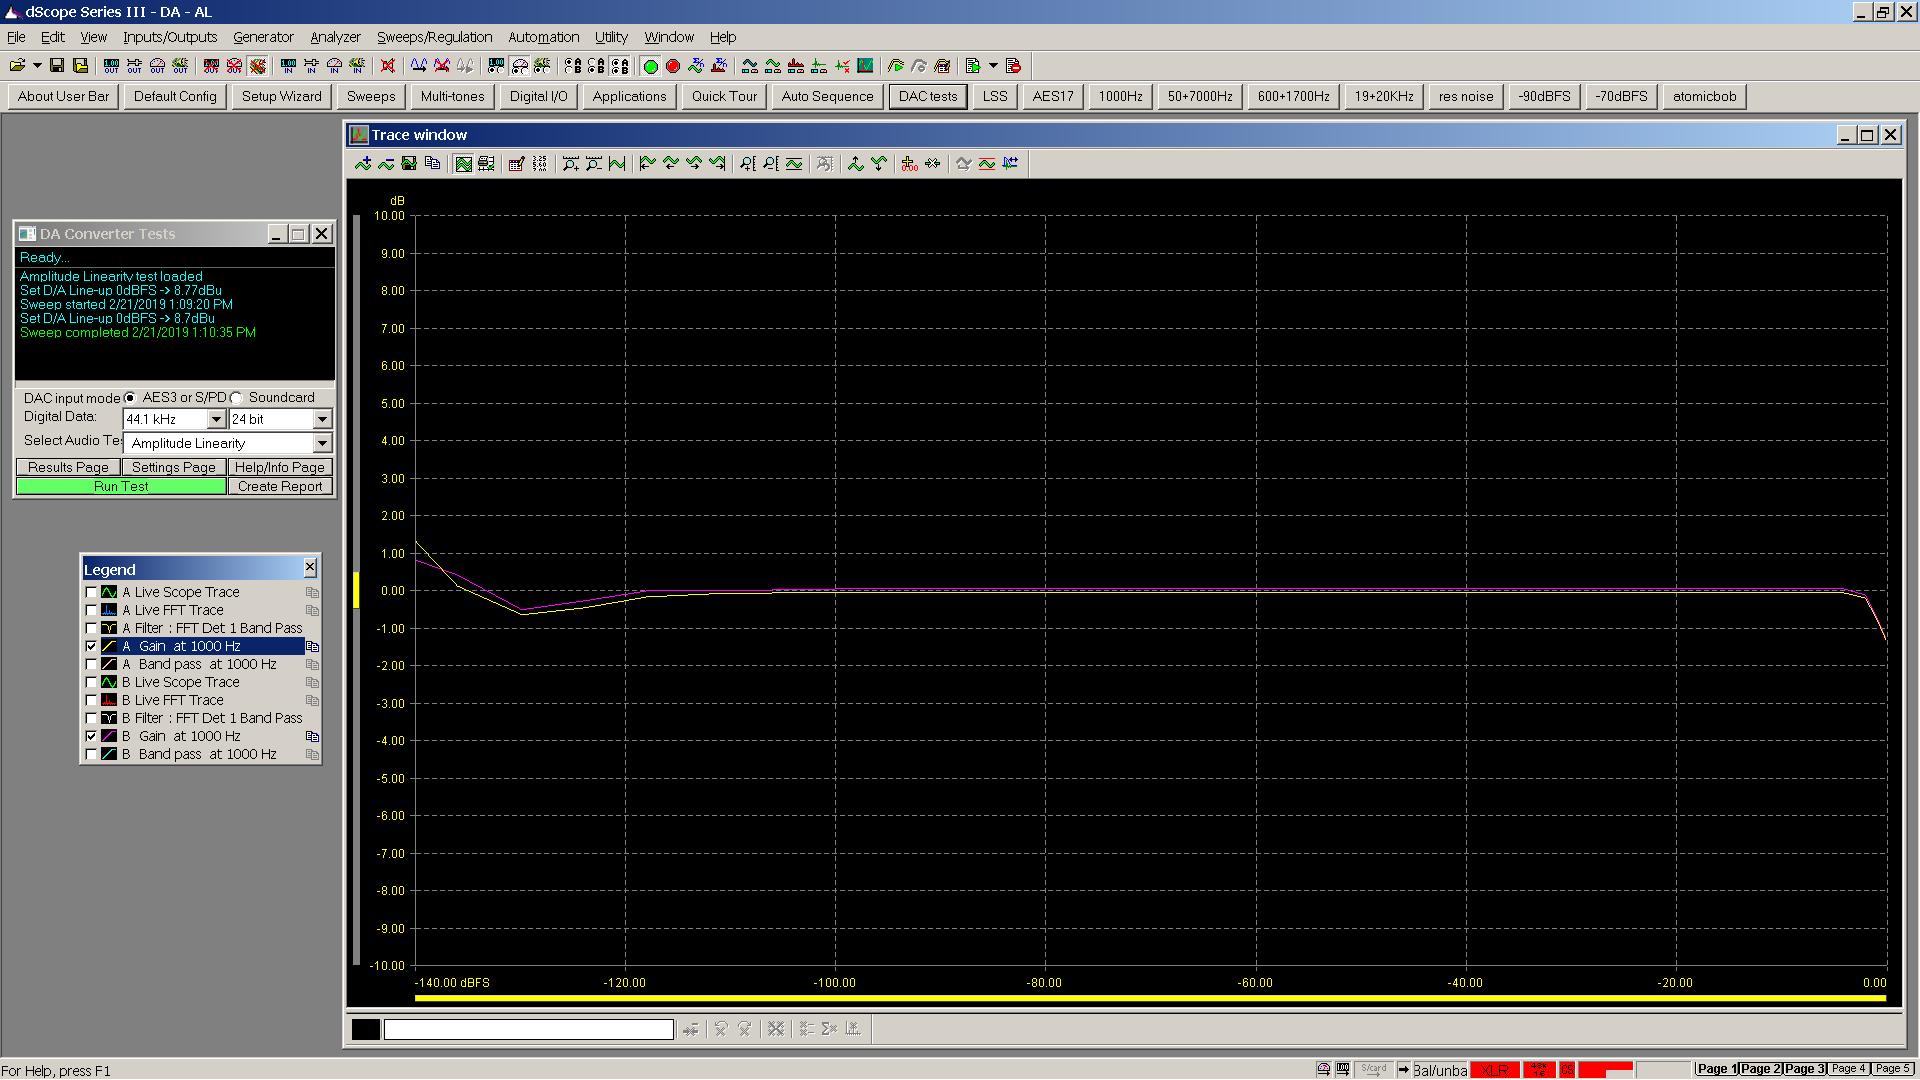 20190221 DSHA-3F 1 KHz gain linearity 30R.PNG